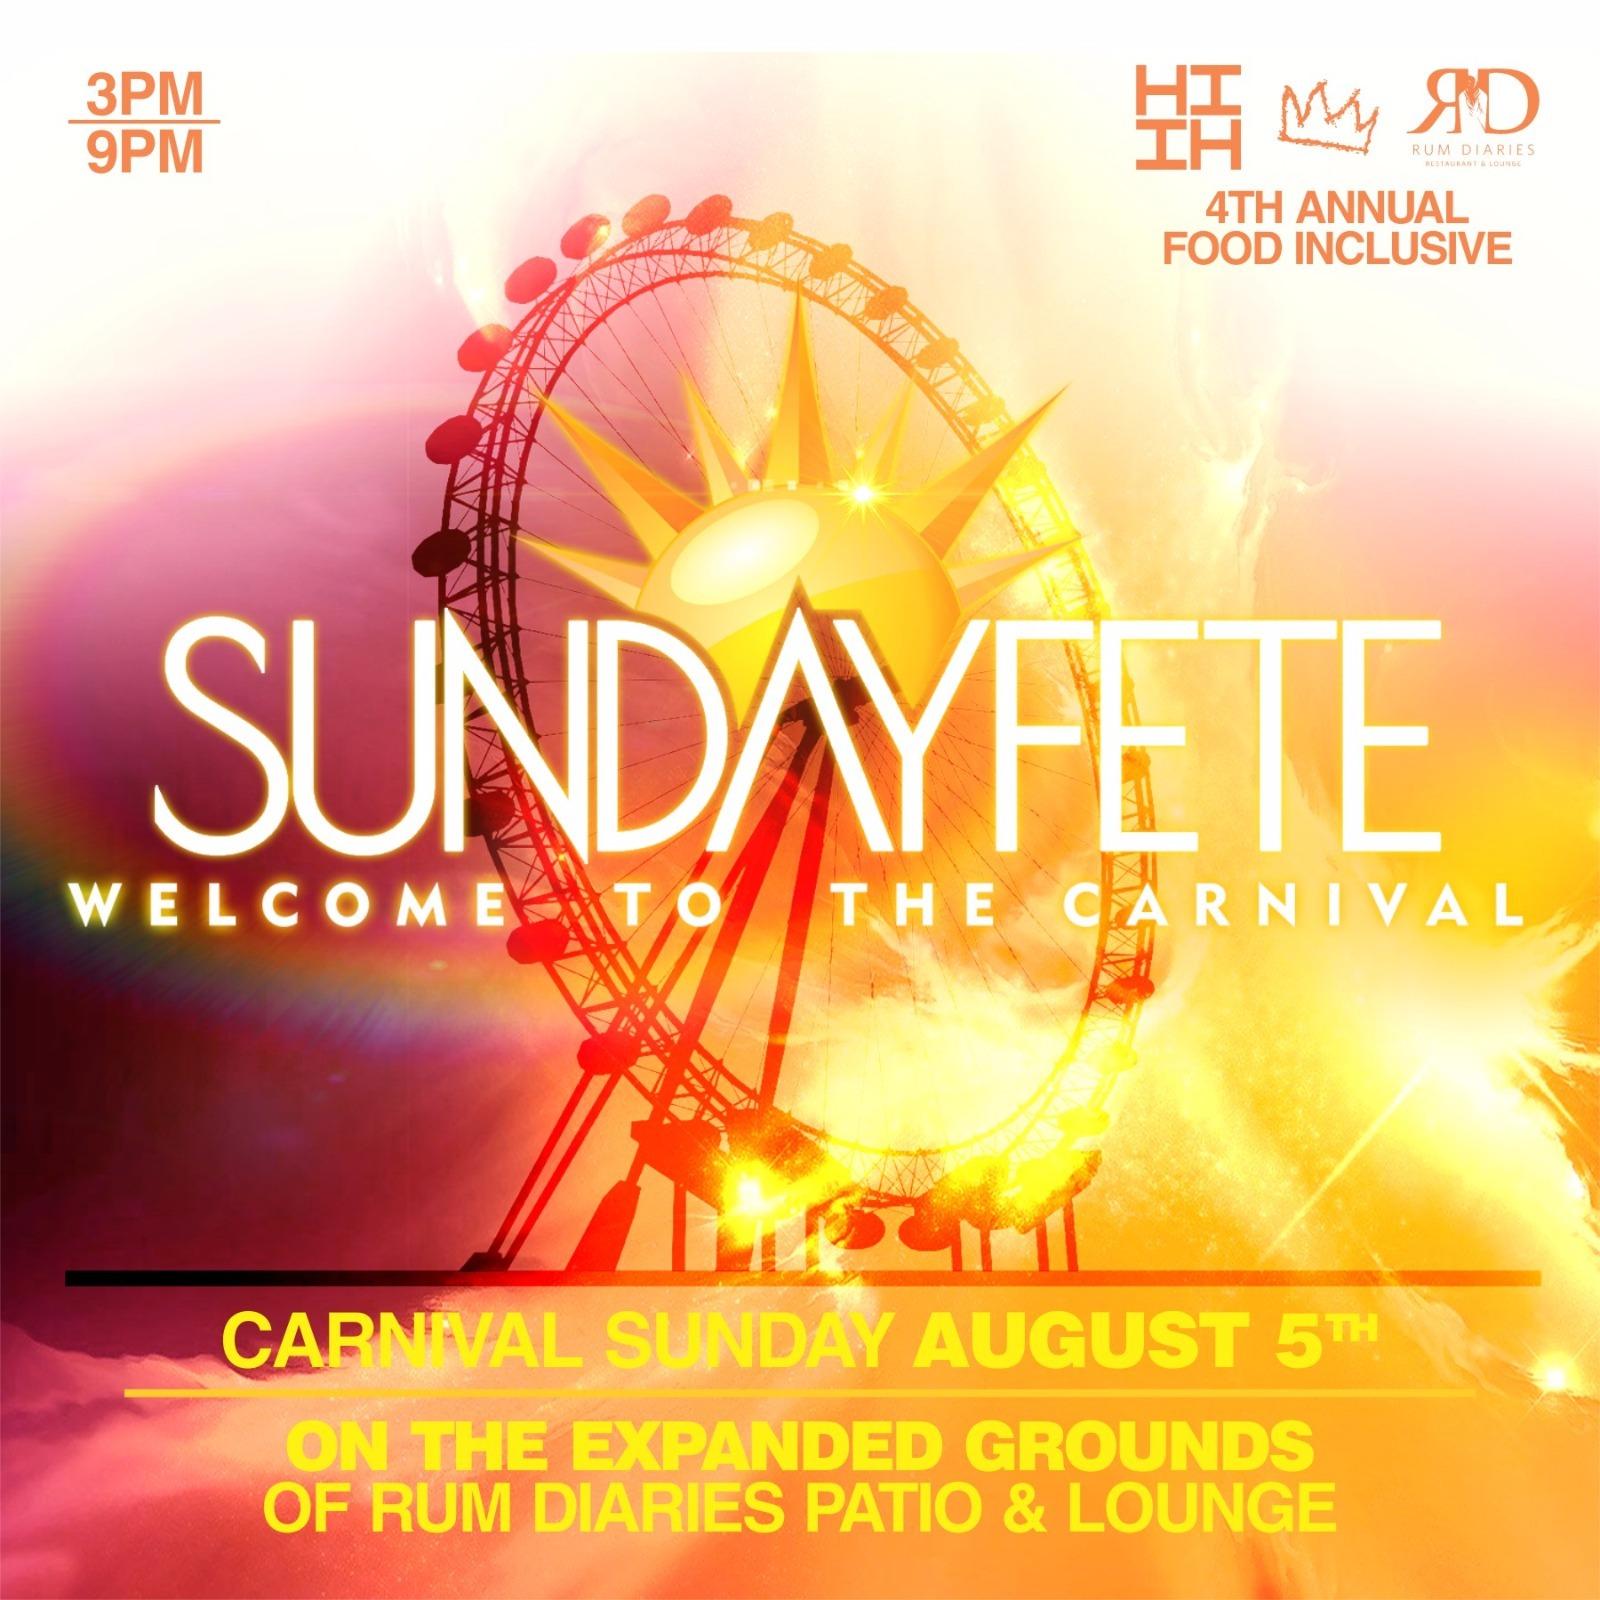 SunDayFete   Toronto's Ultimate Outdoor